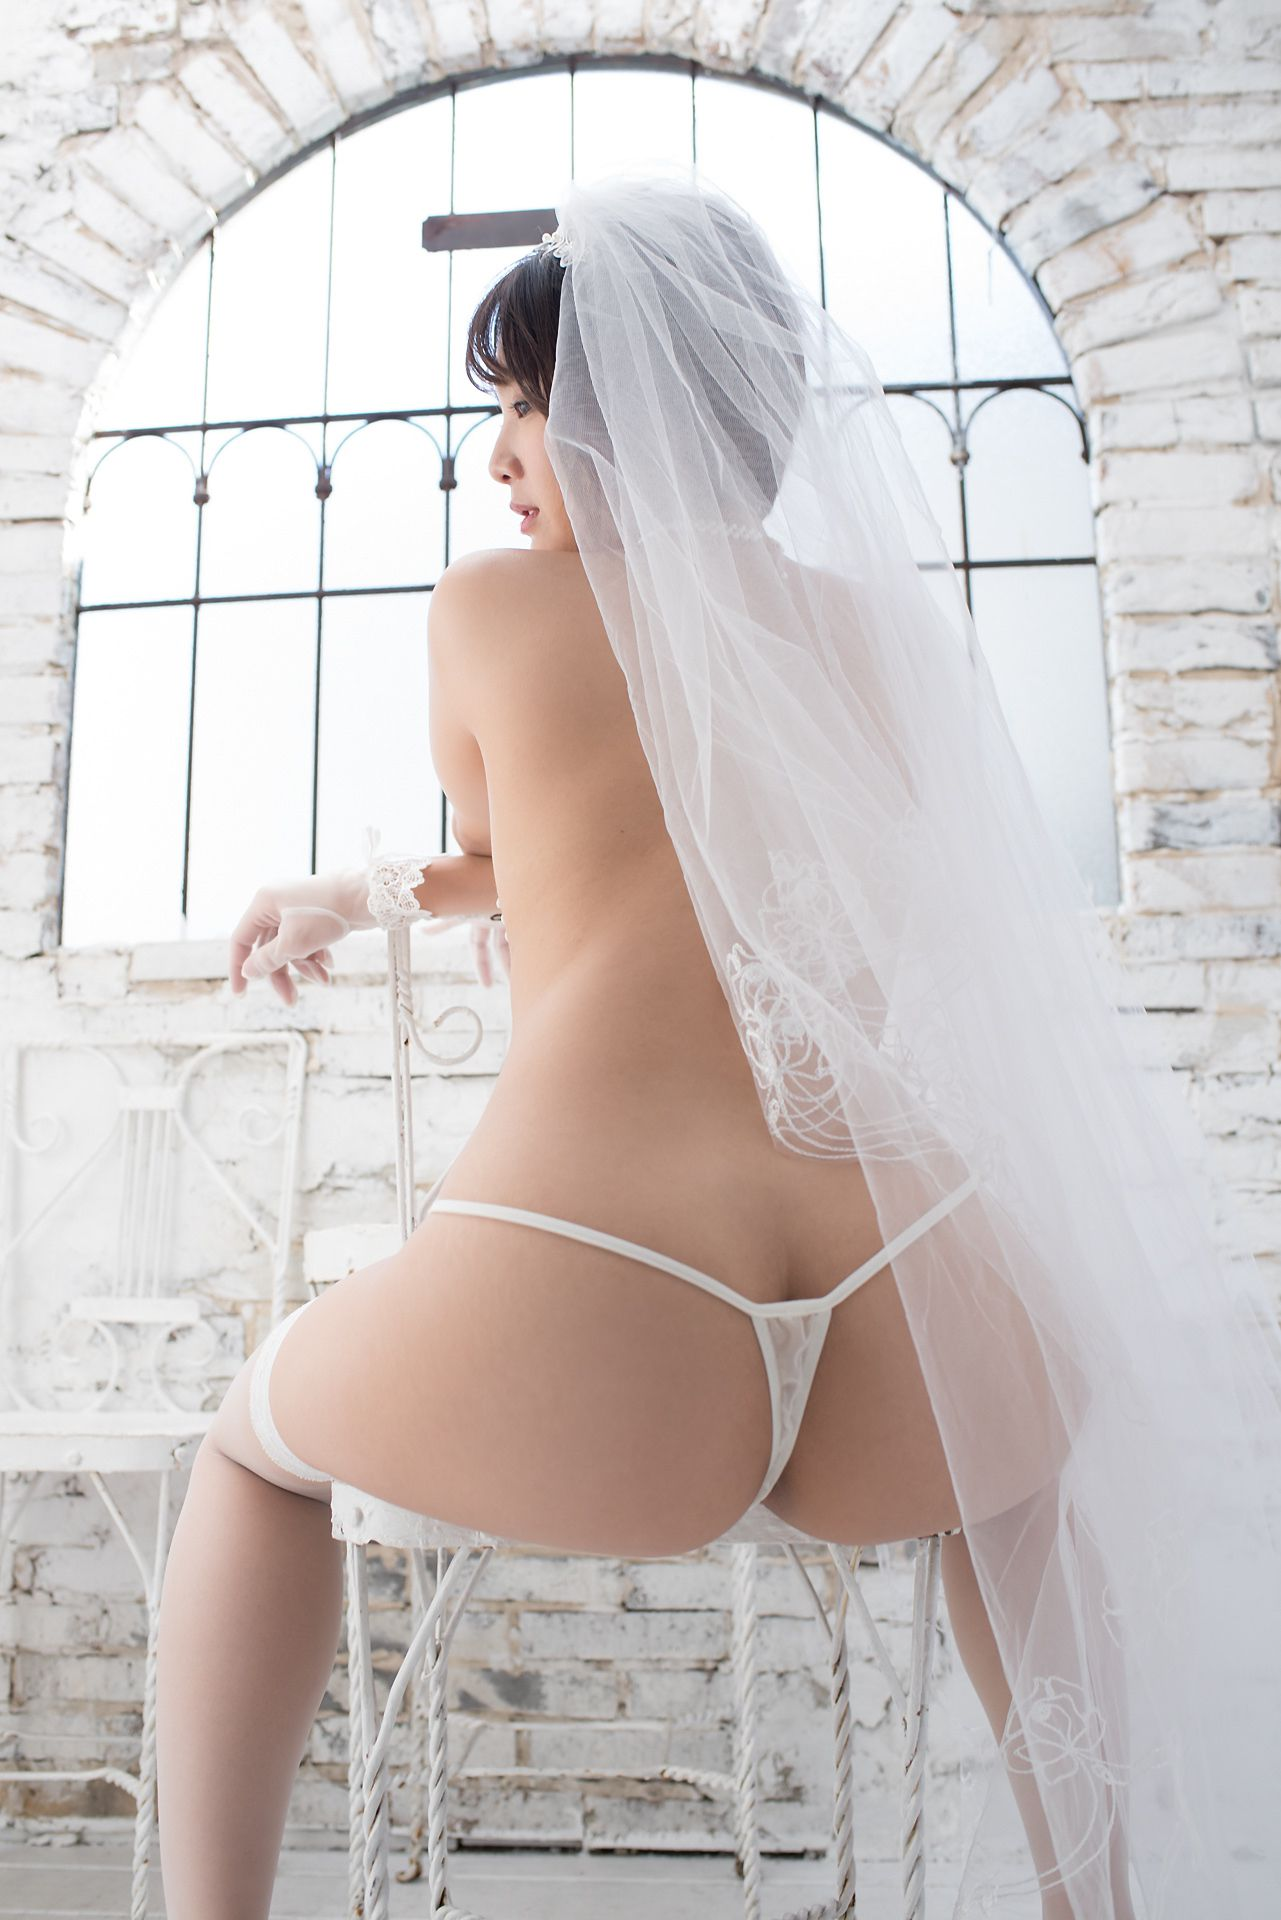 VOL.738 [Minisuka.tv]婚纱肥臀丝袜人体:神前司(神前つかさ)超高清写真套图(40P)